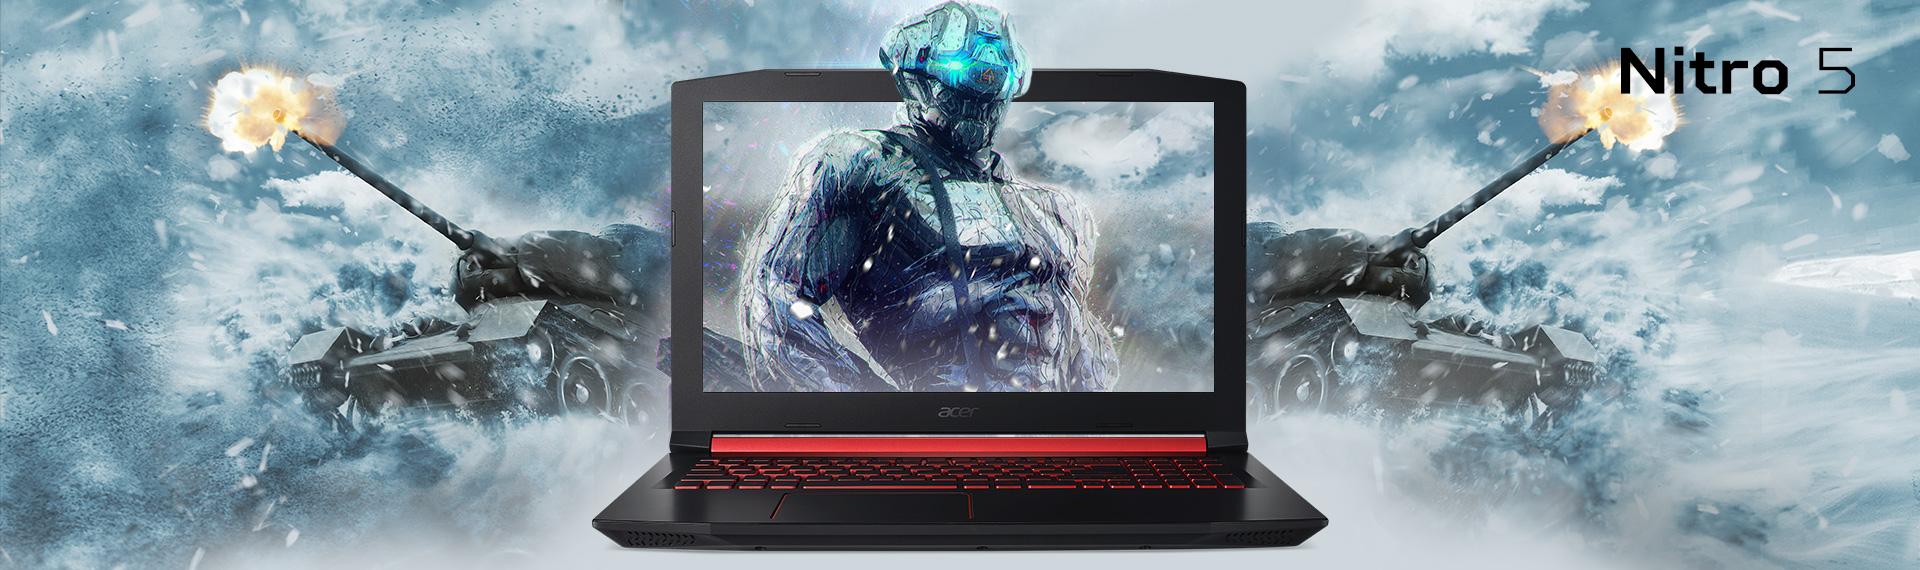 Laptop Nitro 5, Ideal untuk Gamer Casual